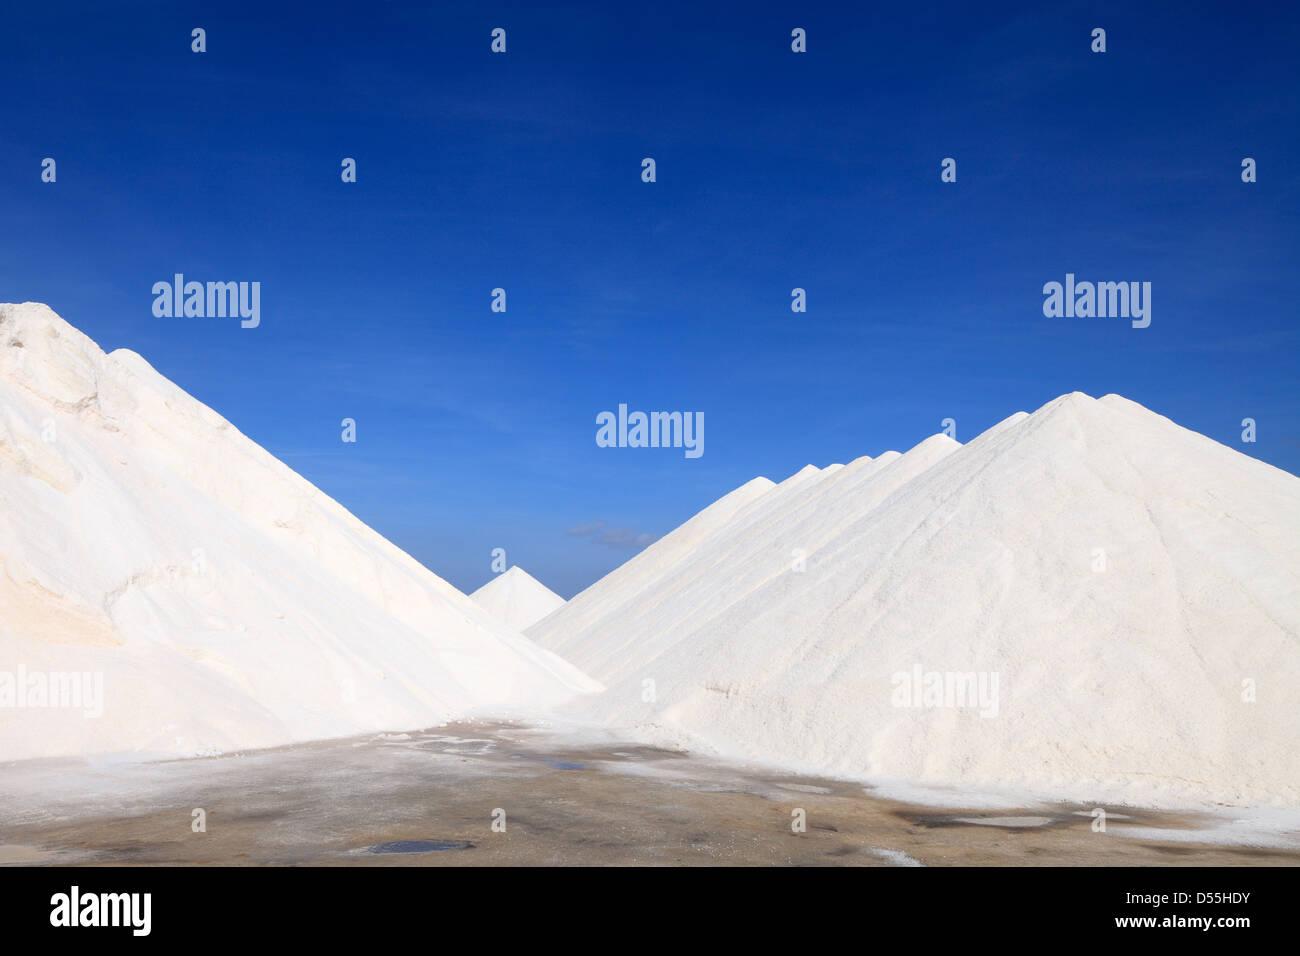 Colonia de Sant Jordi, Spain salt mountains from sea salt - Stock Image